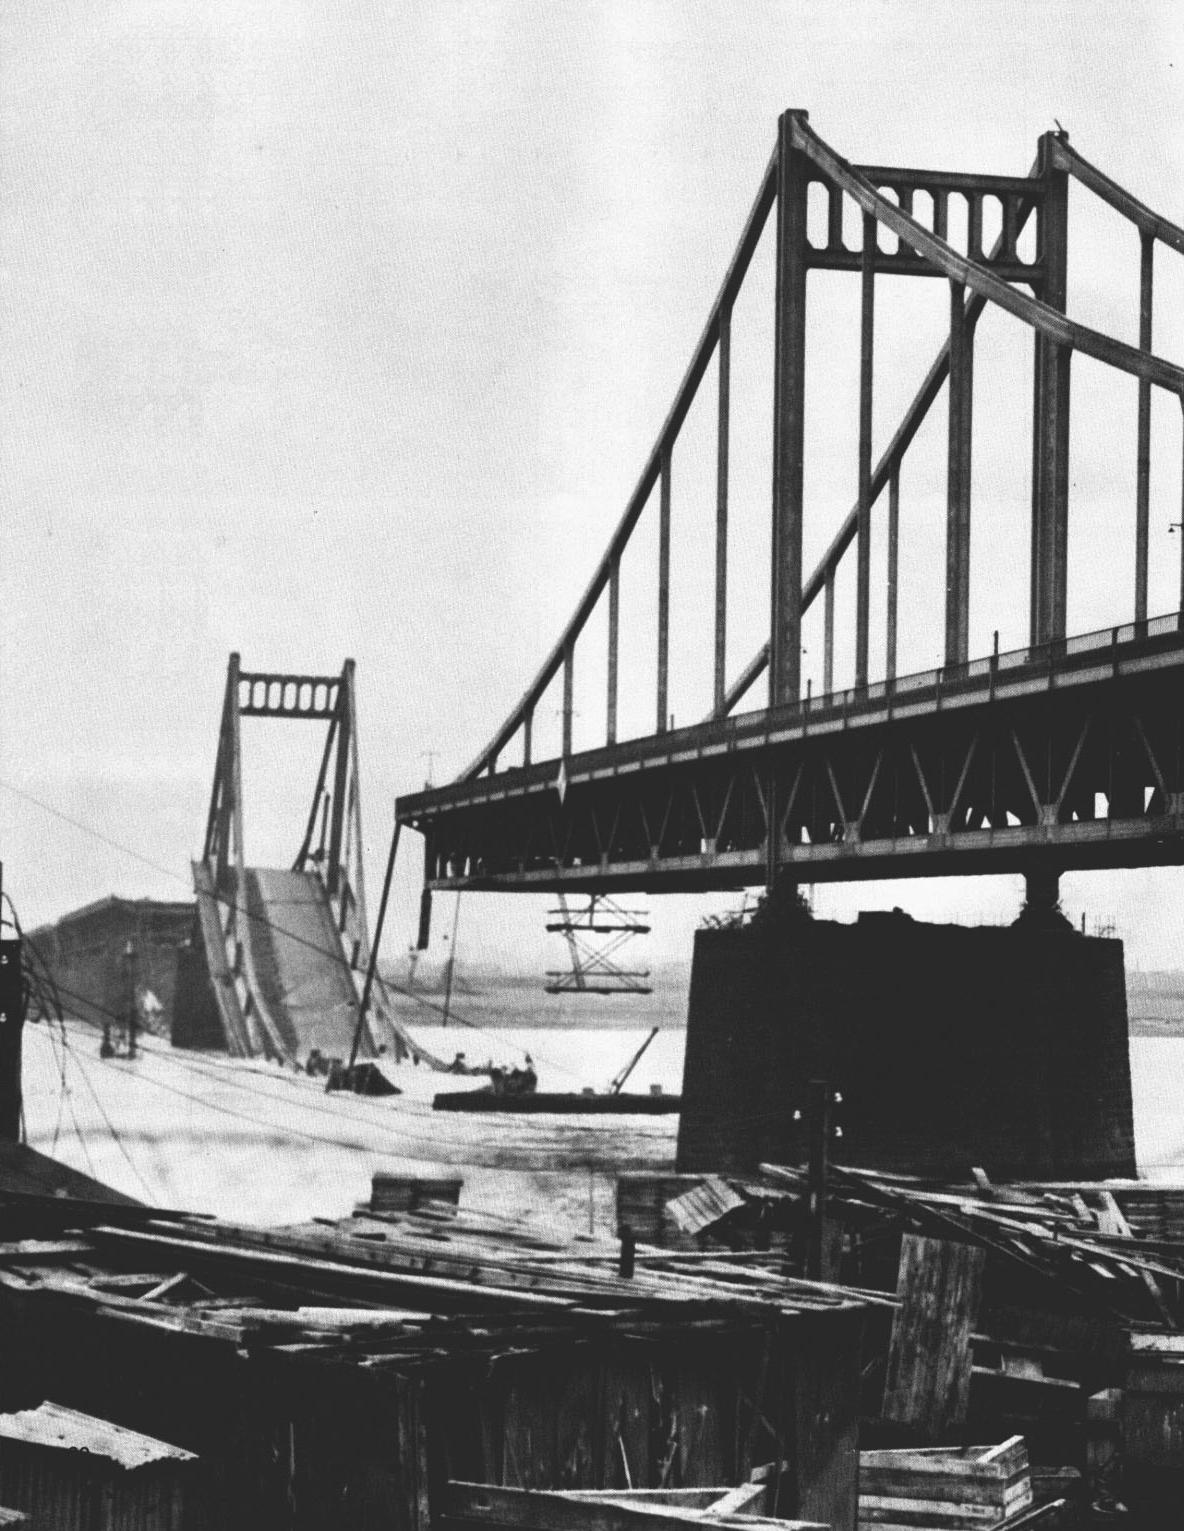 Destroyed_Krefeld-Uerdinger_Rheinbruecke_1945 (Source Wikipedia)